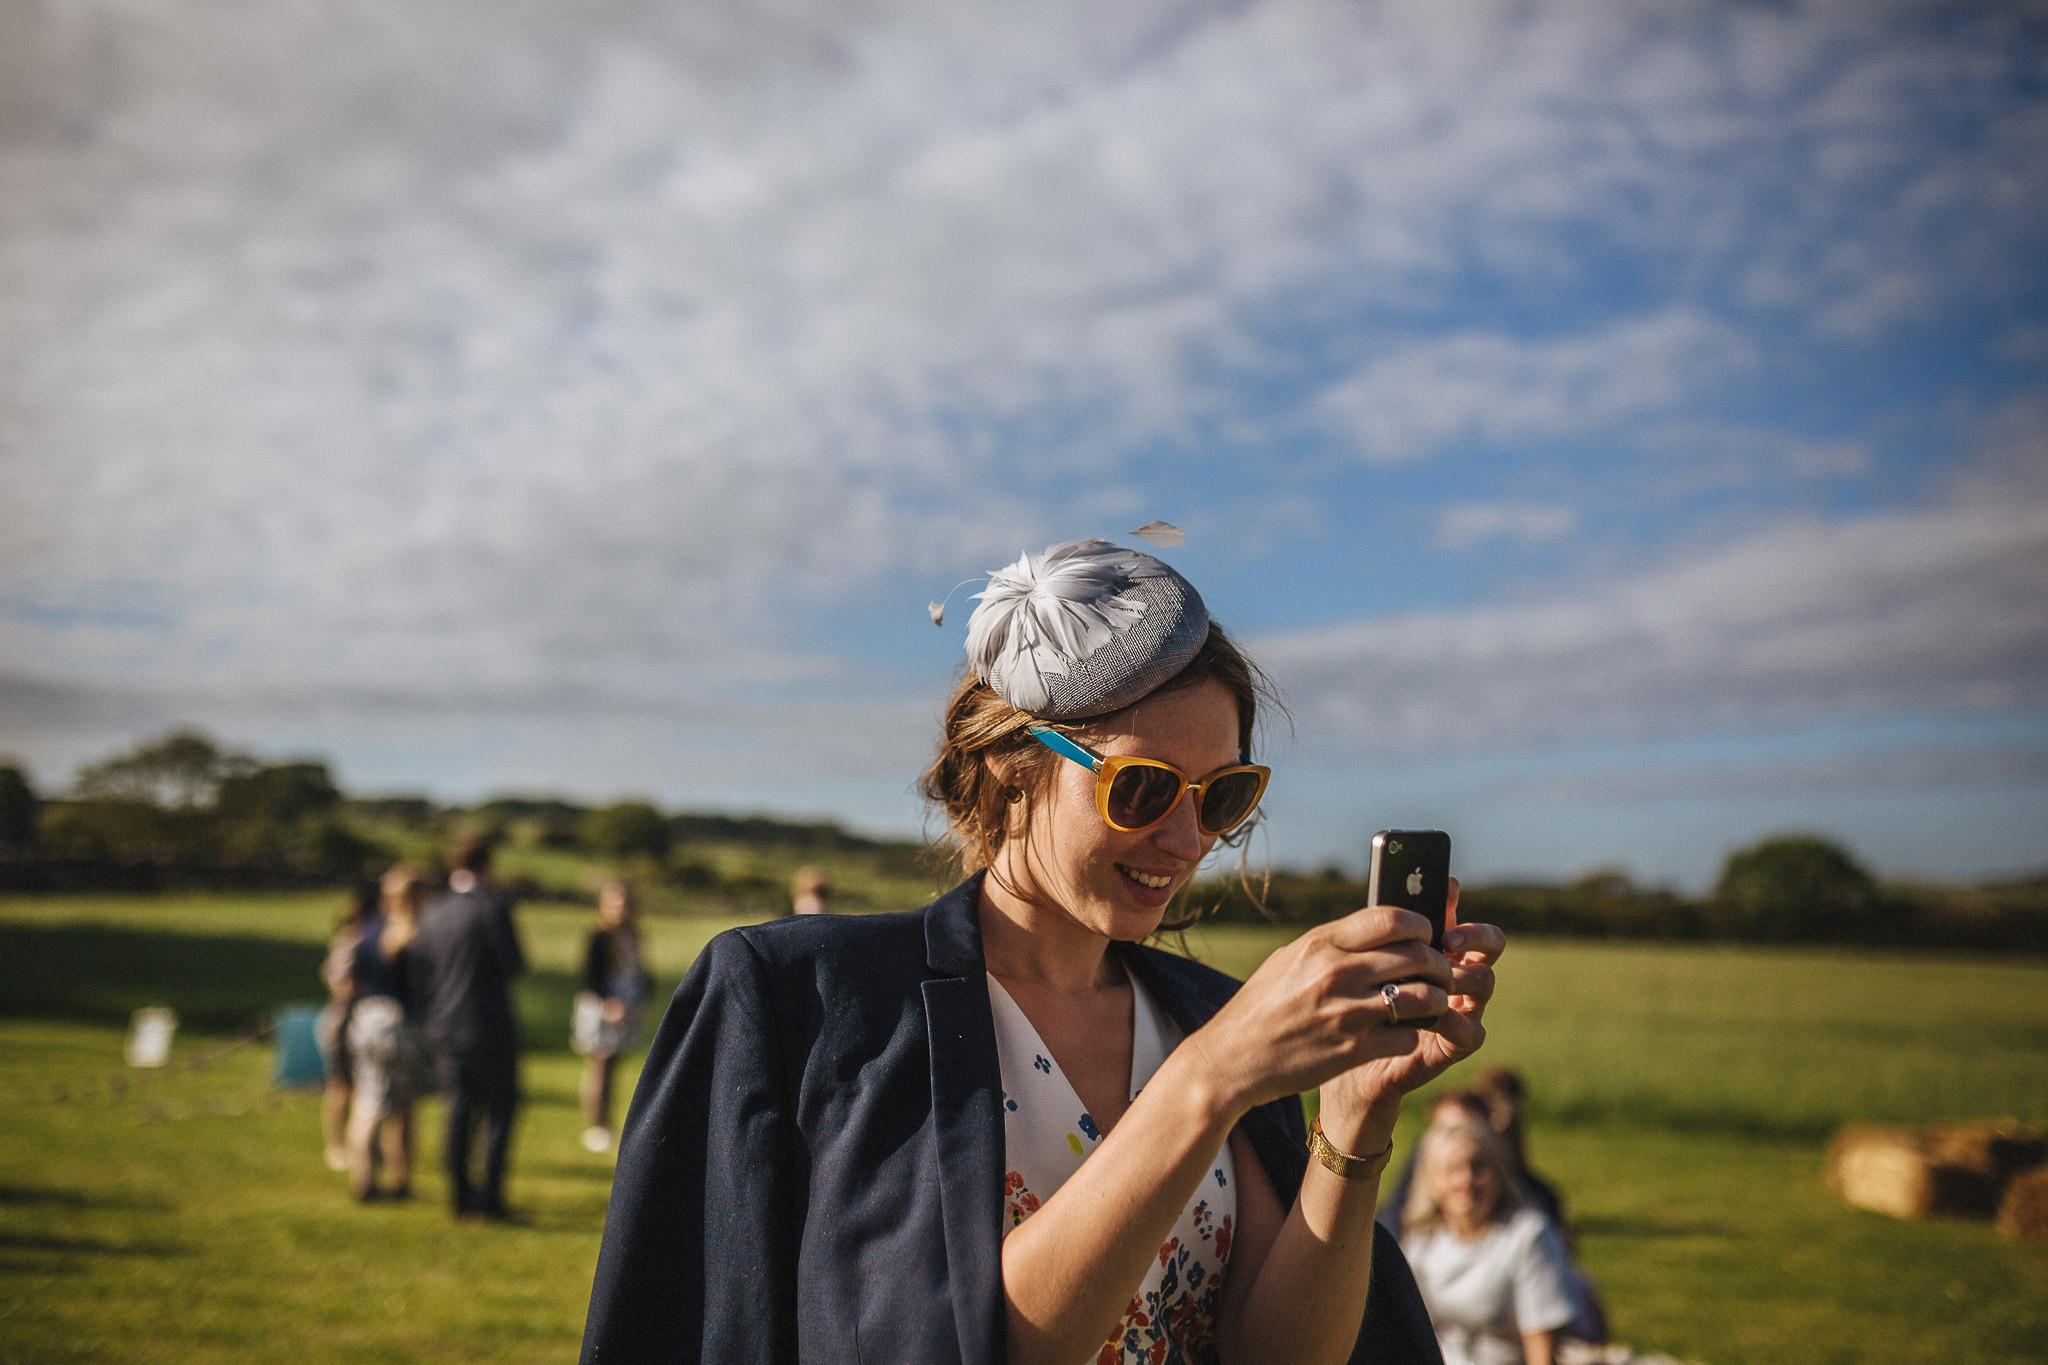 paul-marbrook-Farm-Wedding-Photographer-Lancashire-90064